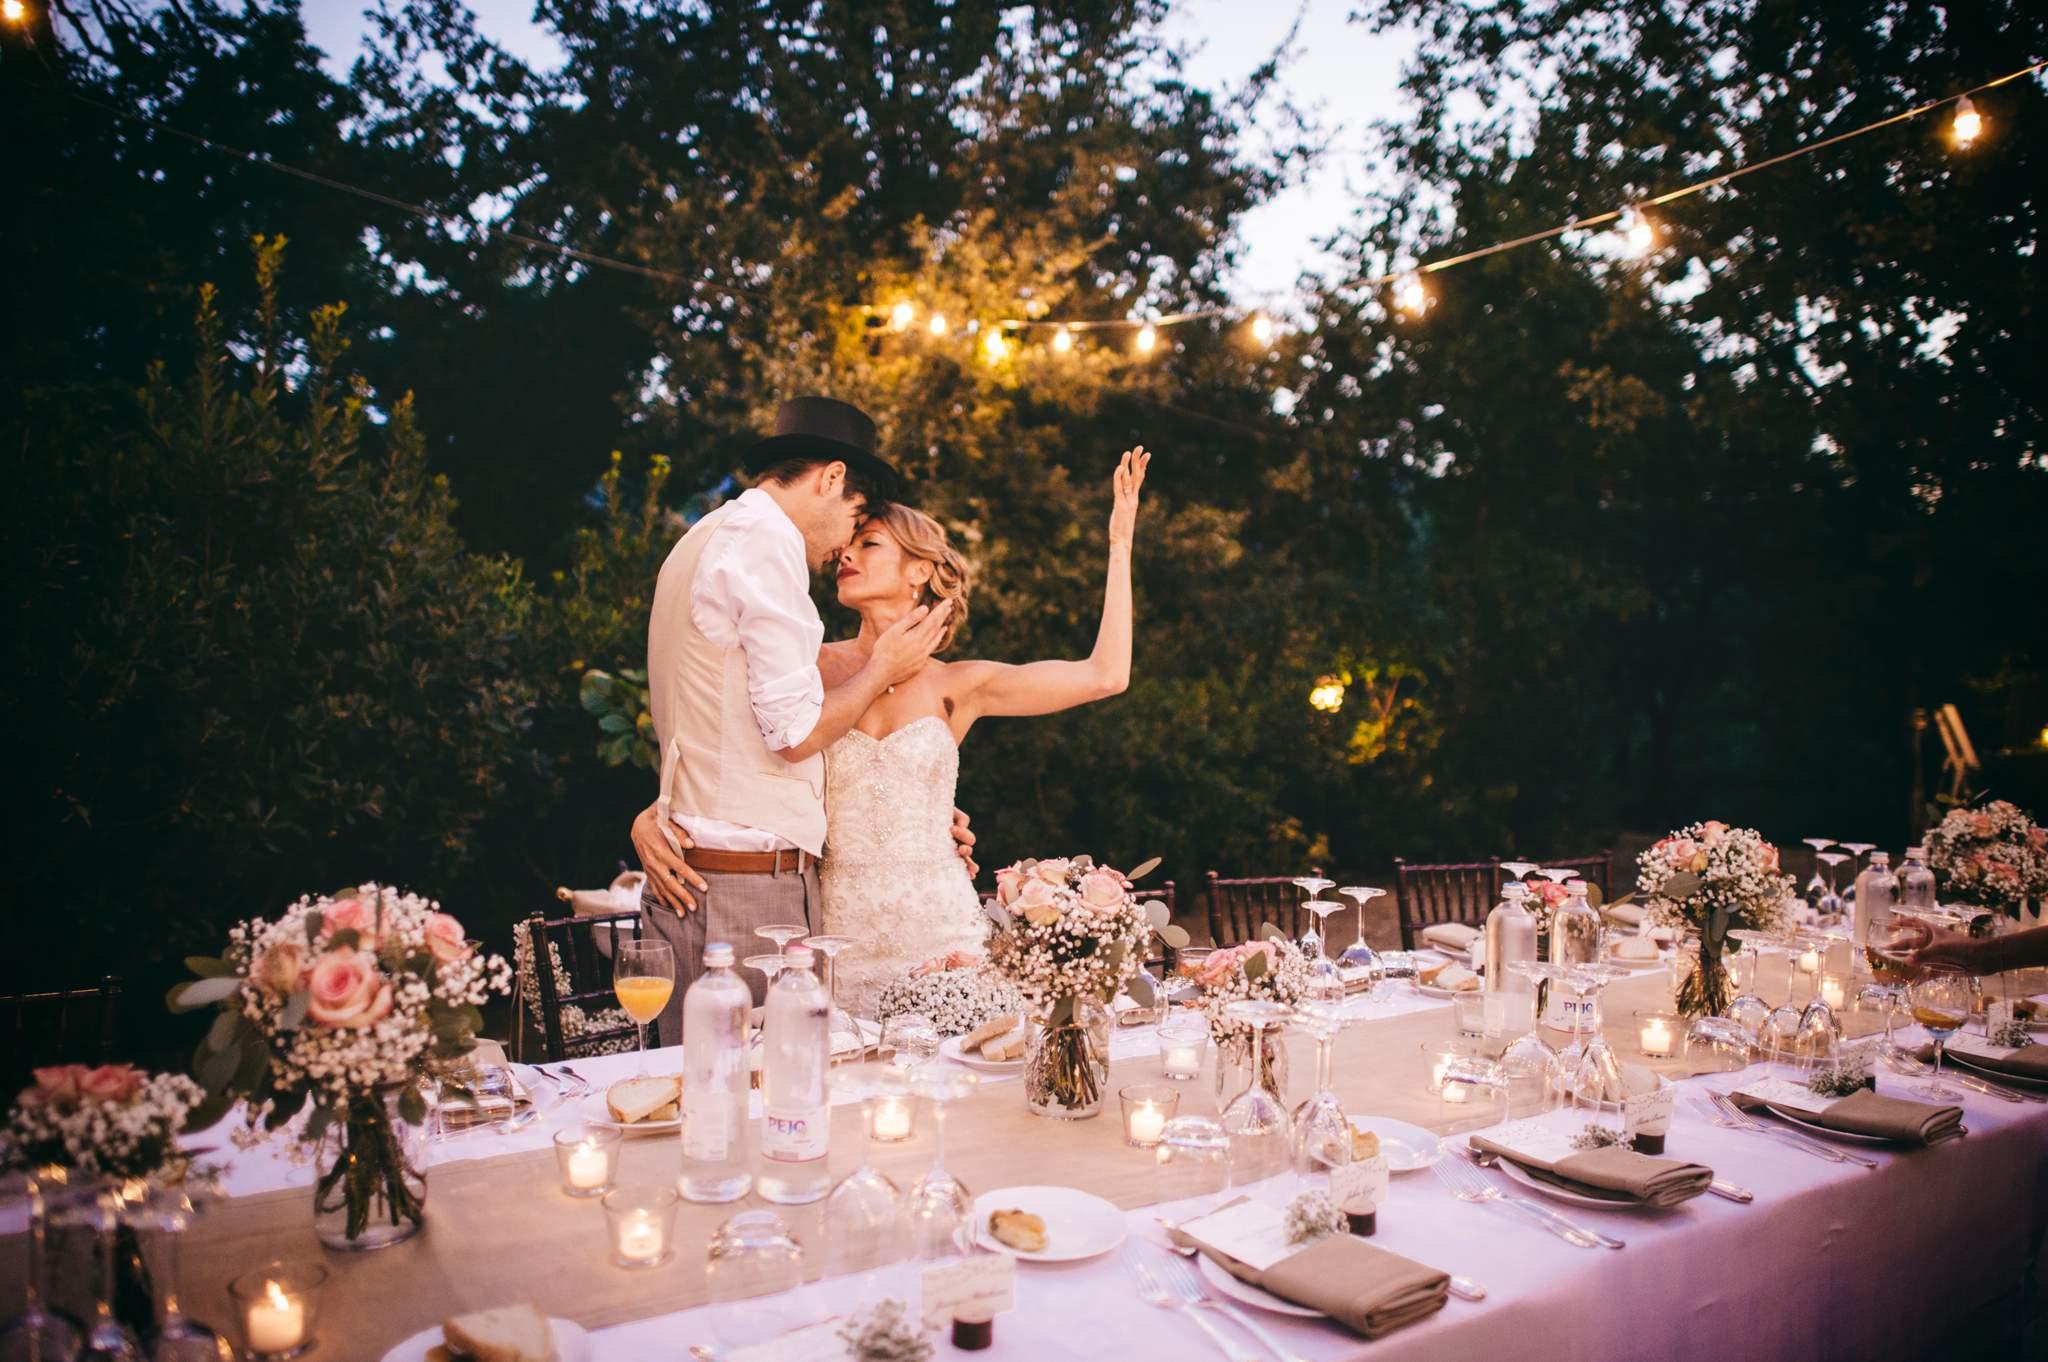 35fotografo-matrimonio-toscana-villa-teresa